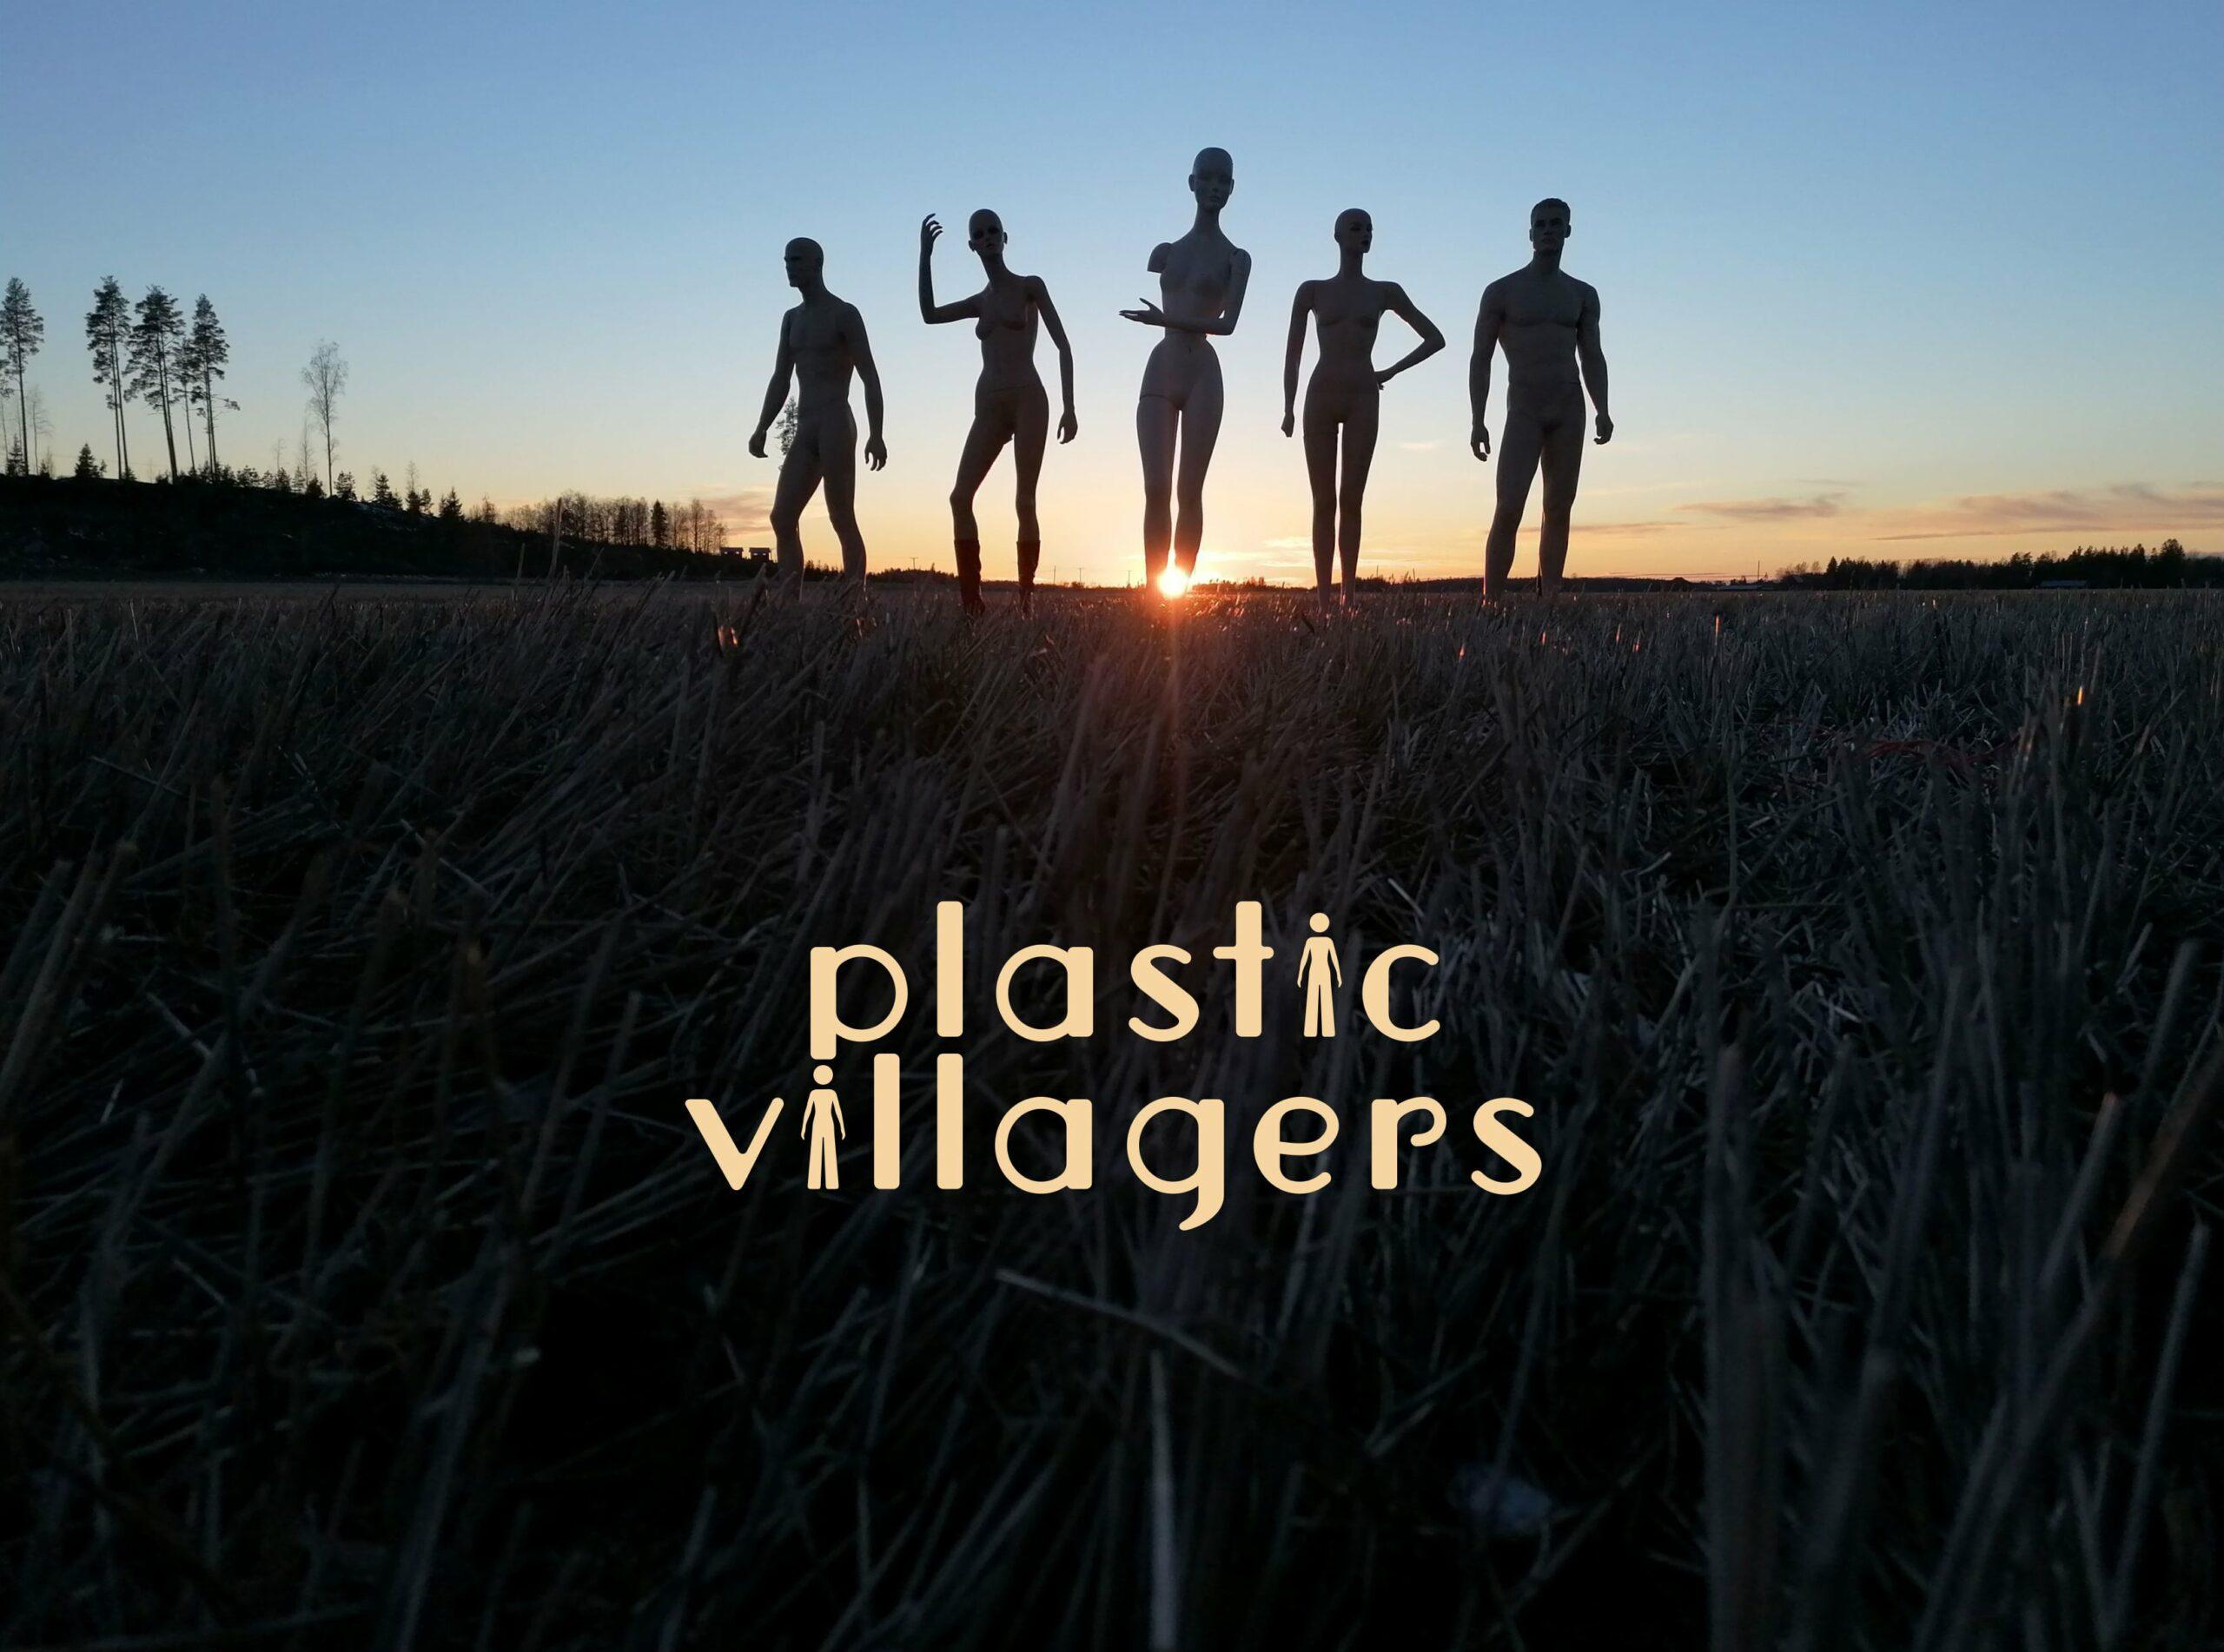 Plastic Villagers